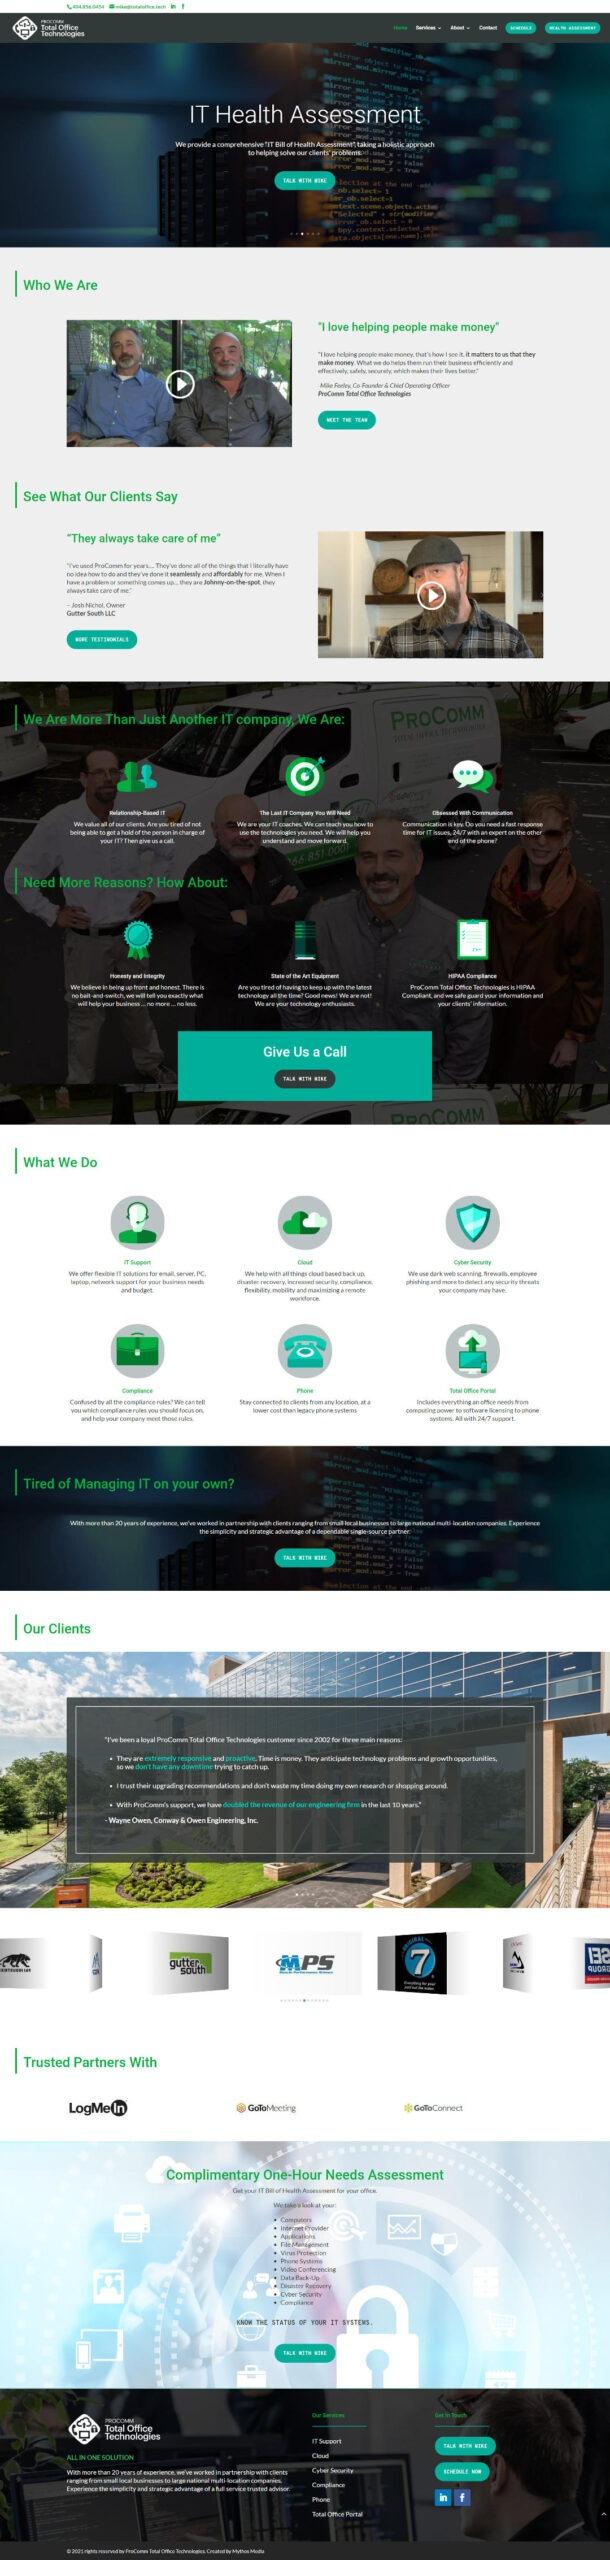 Procomm Total Office Technologies Website by Mythos Media